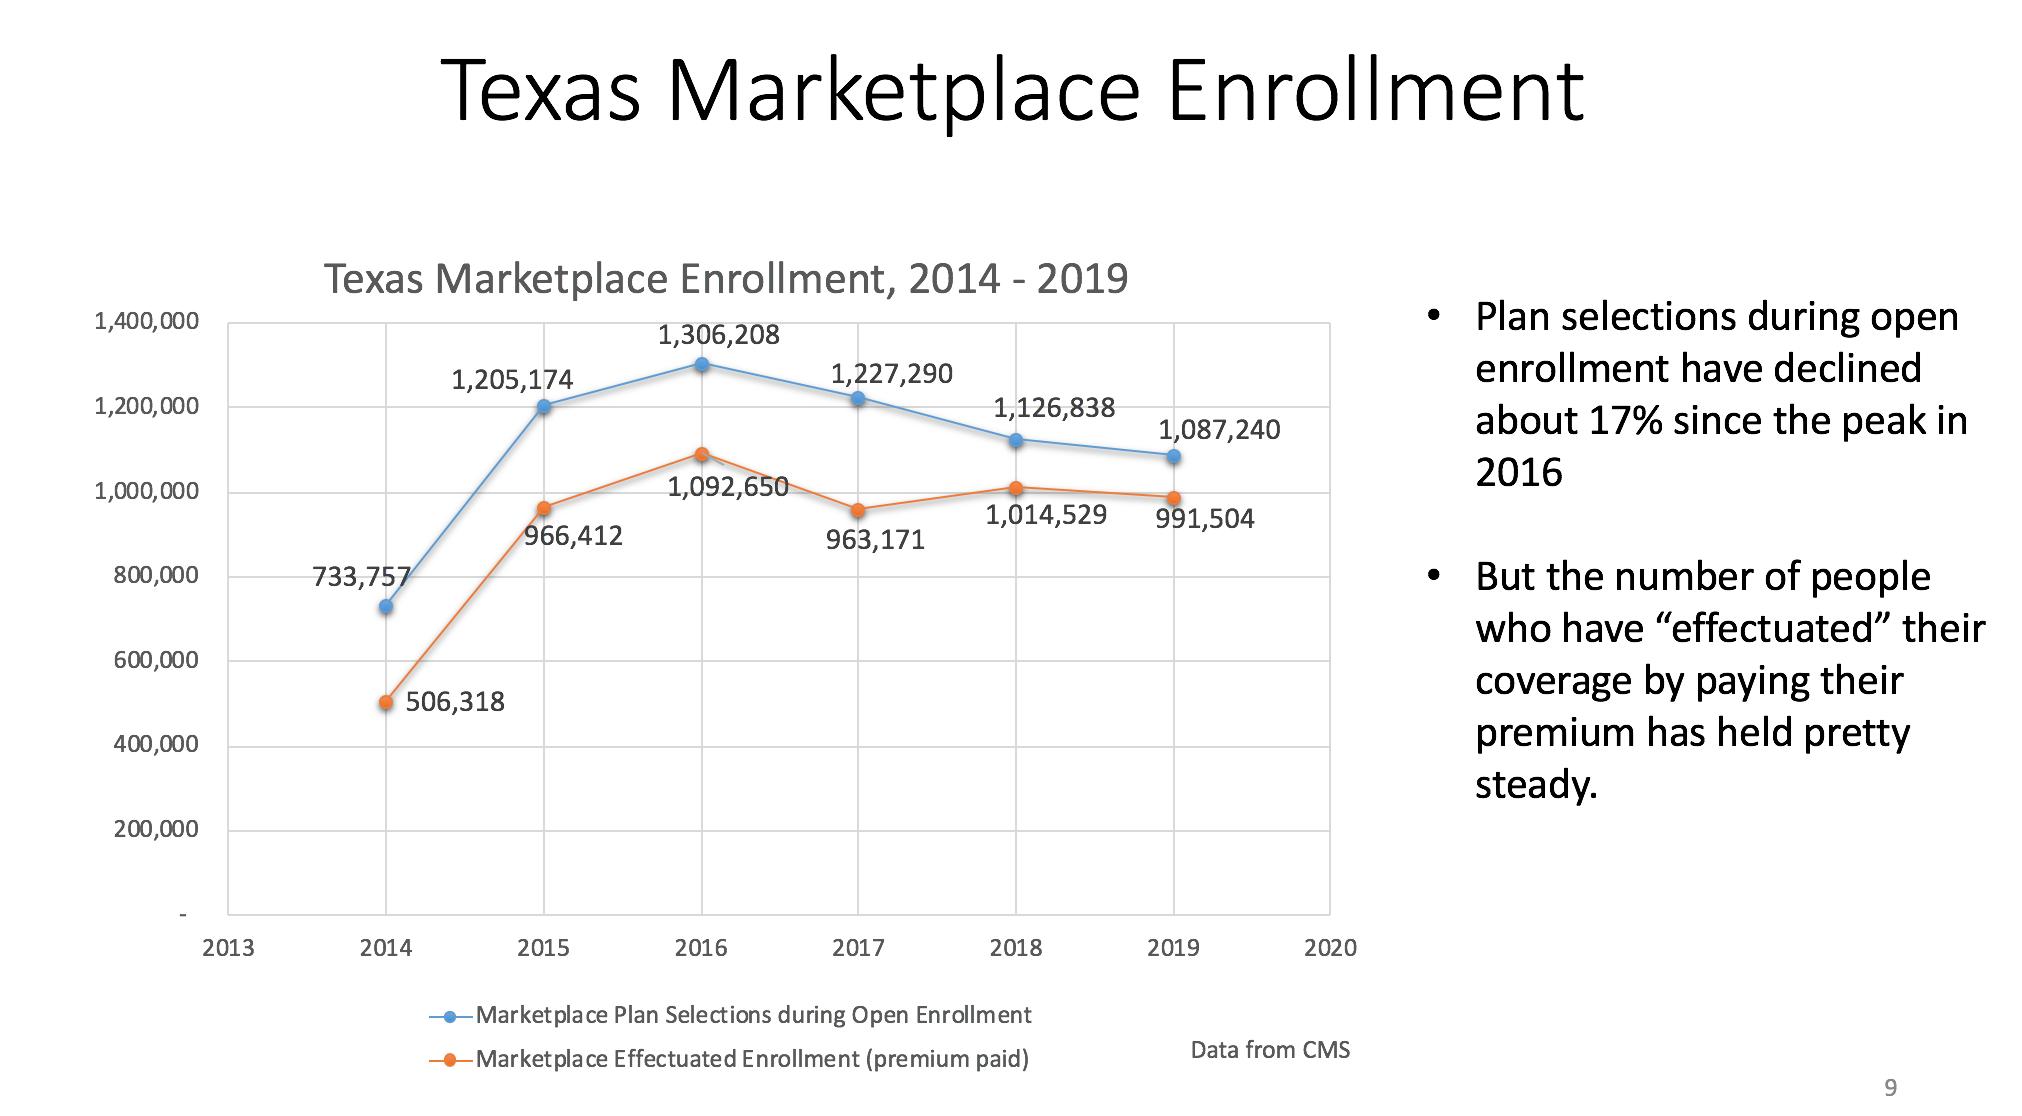 Texas Marketplace Enrollment